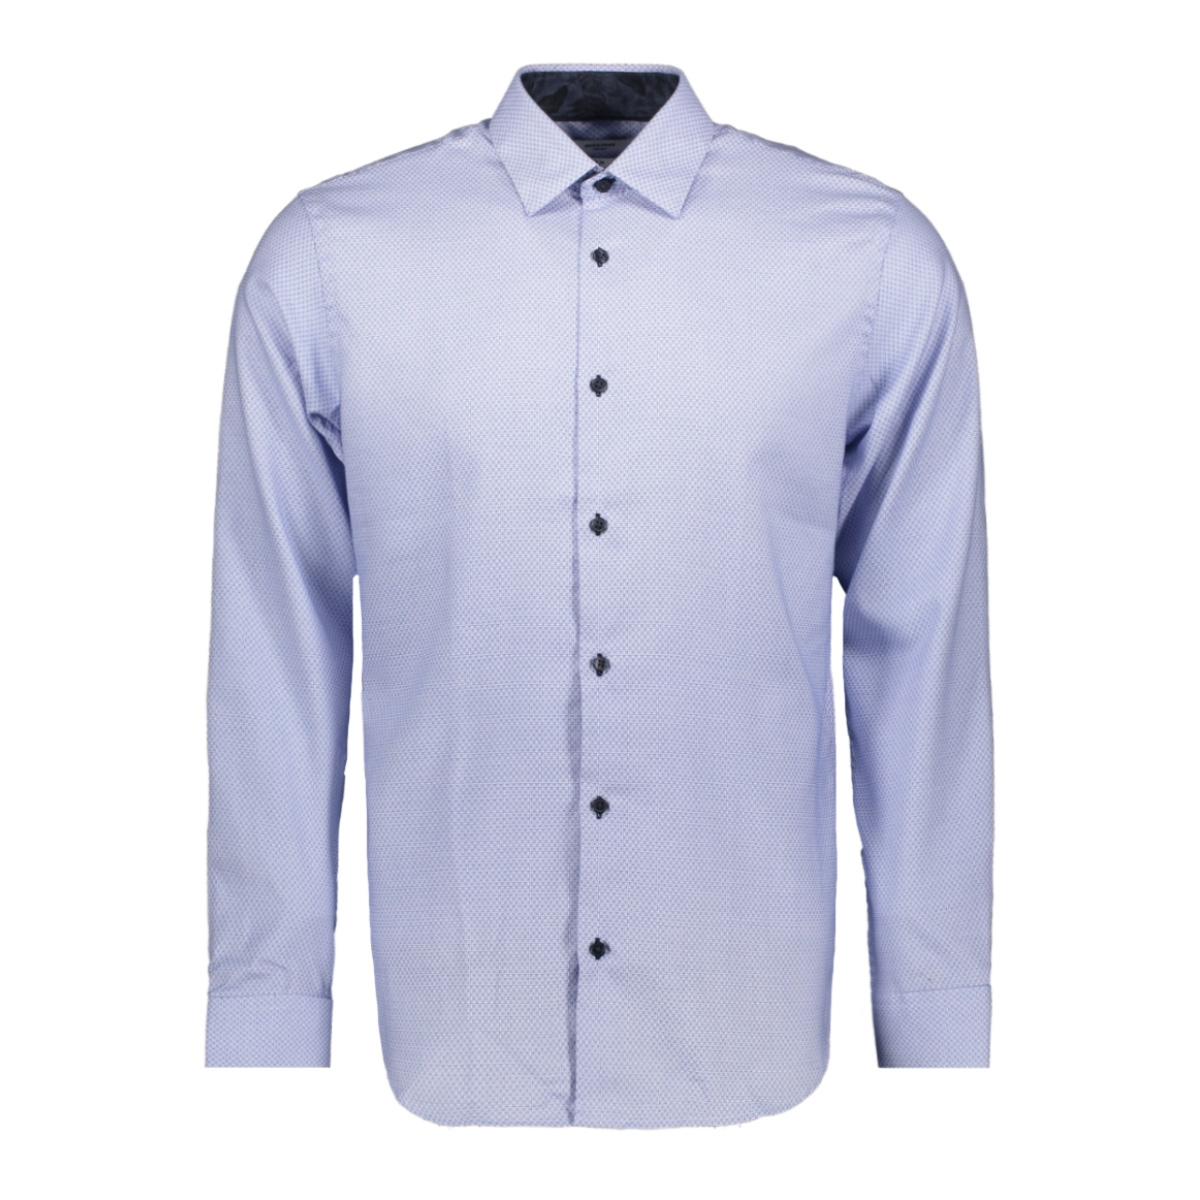 jprmason detail shirt l/s 12162279 jack & jones overhemd cashmere blue/slimfit